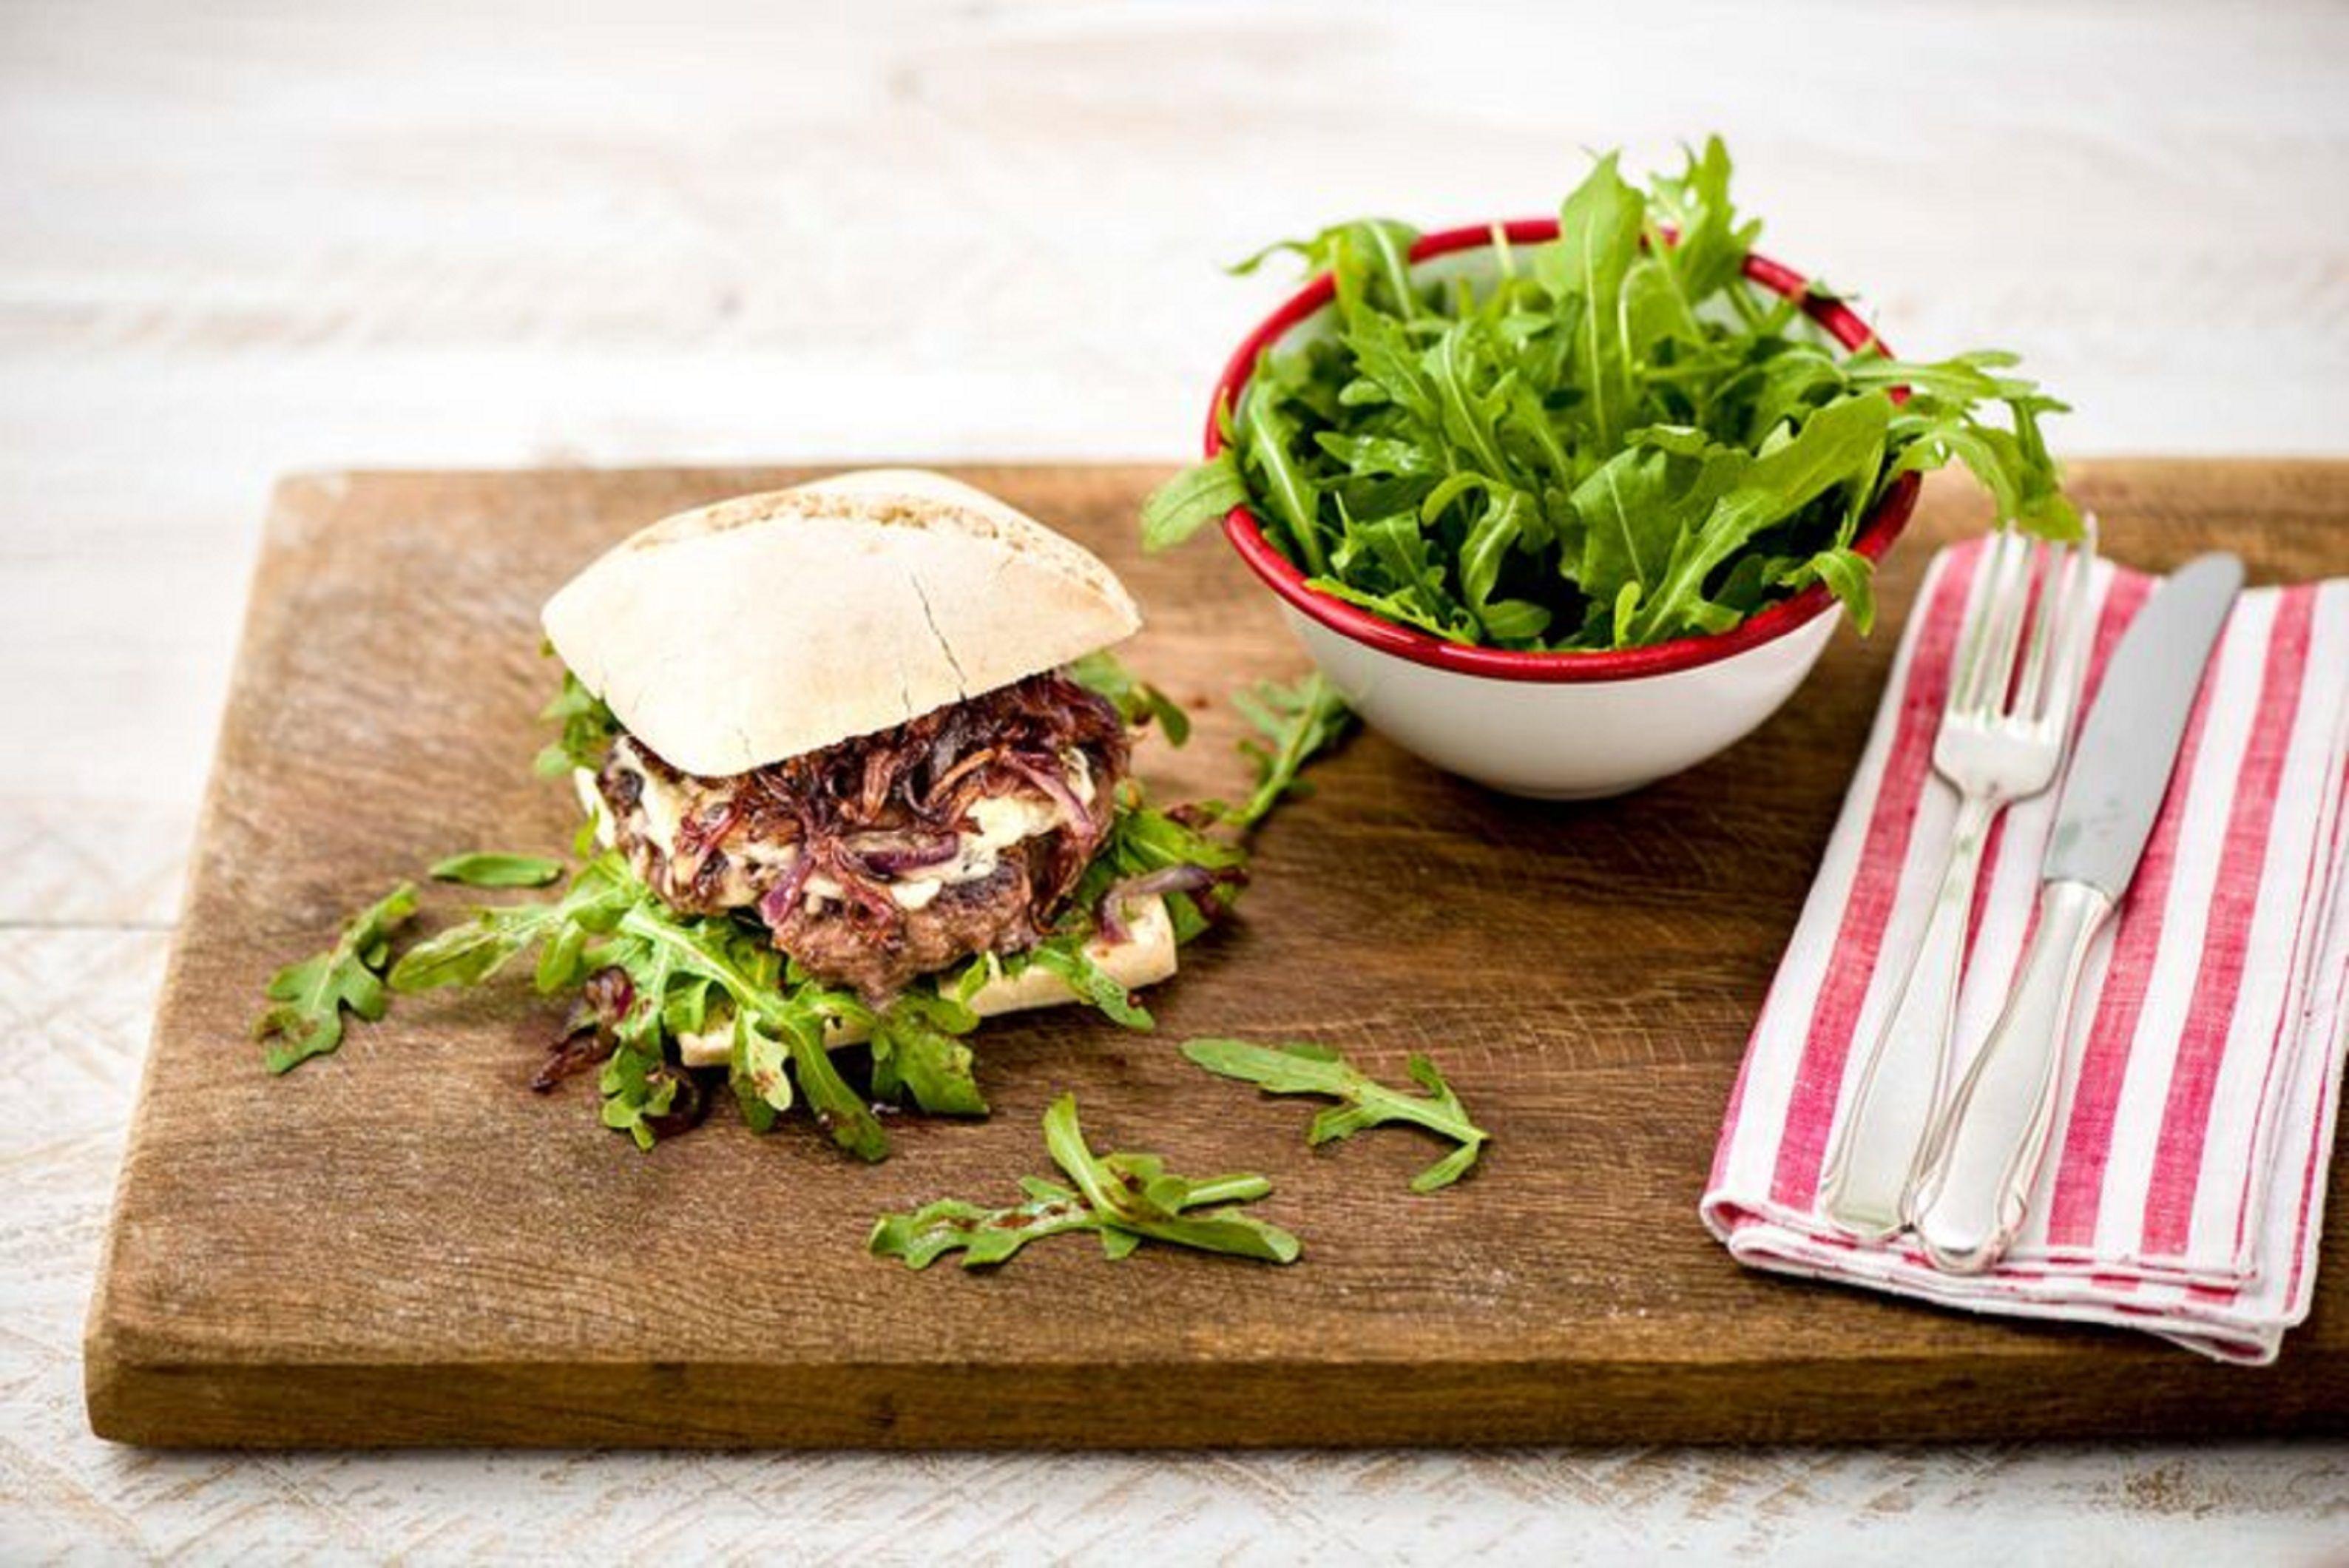 Blue apron lemongrass burger - Italian Ciabatta Burgers With Caramelized Onion Mozzarella And Sweet And Tangy Arugula Salad